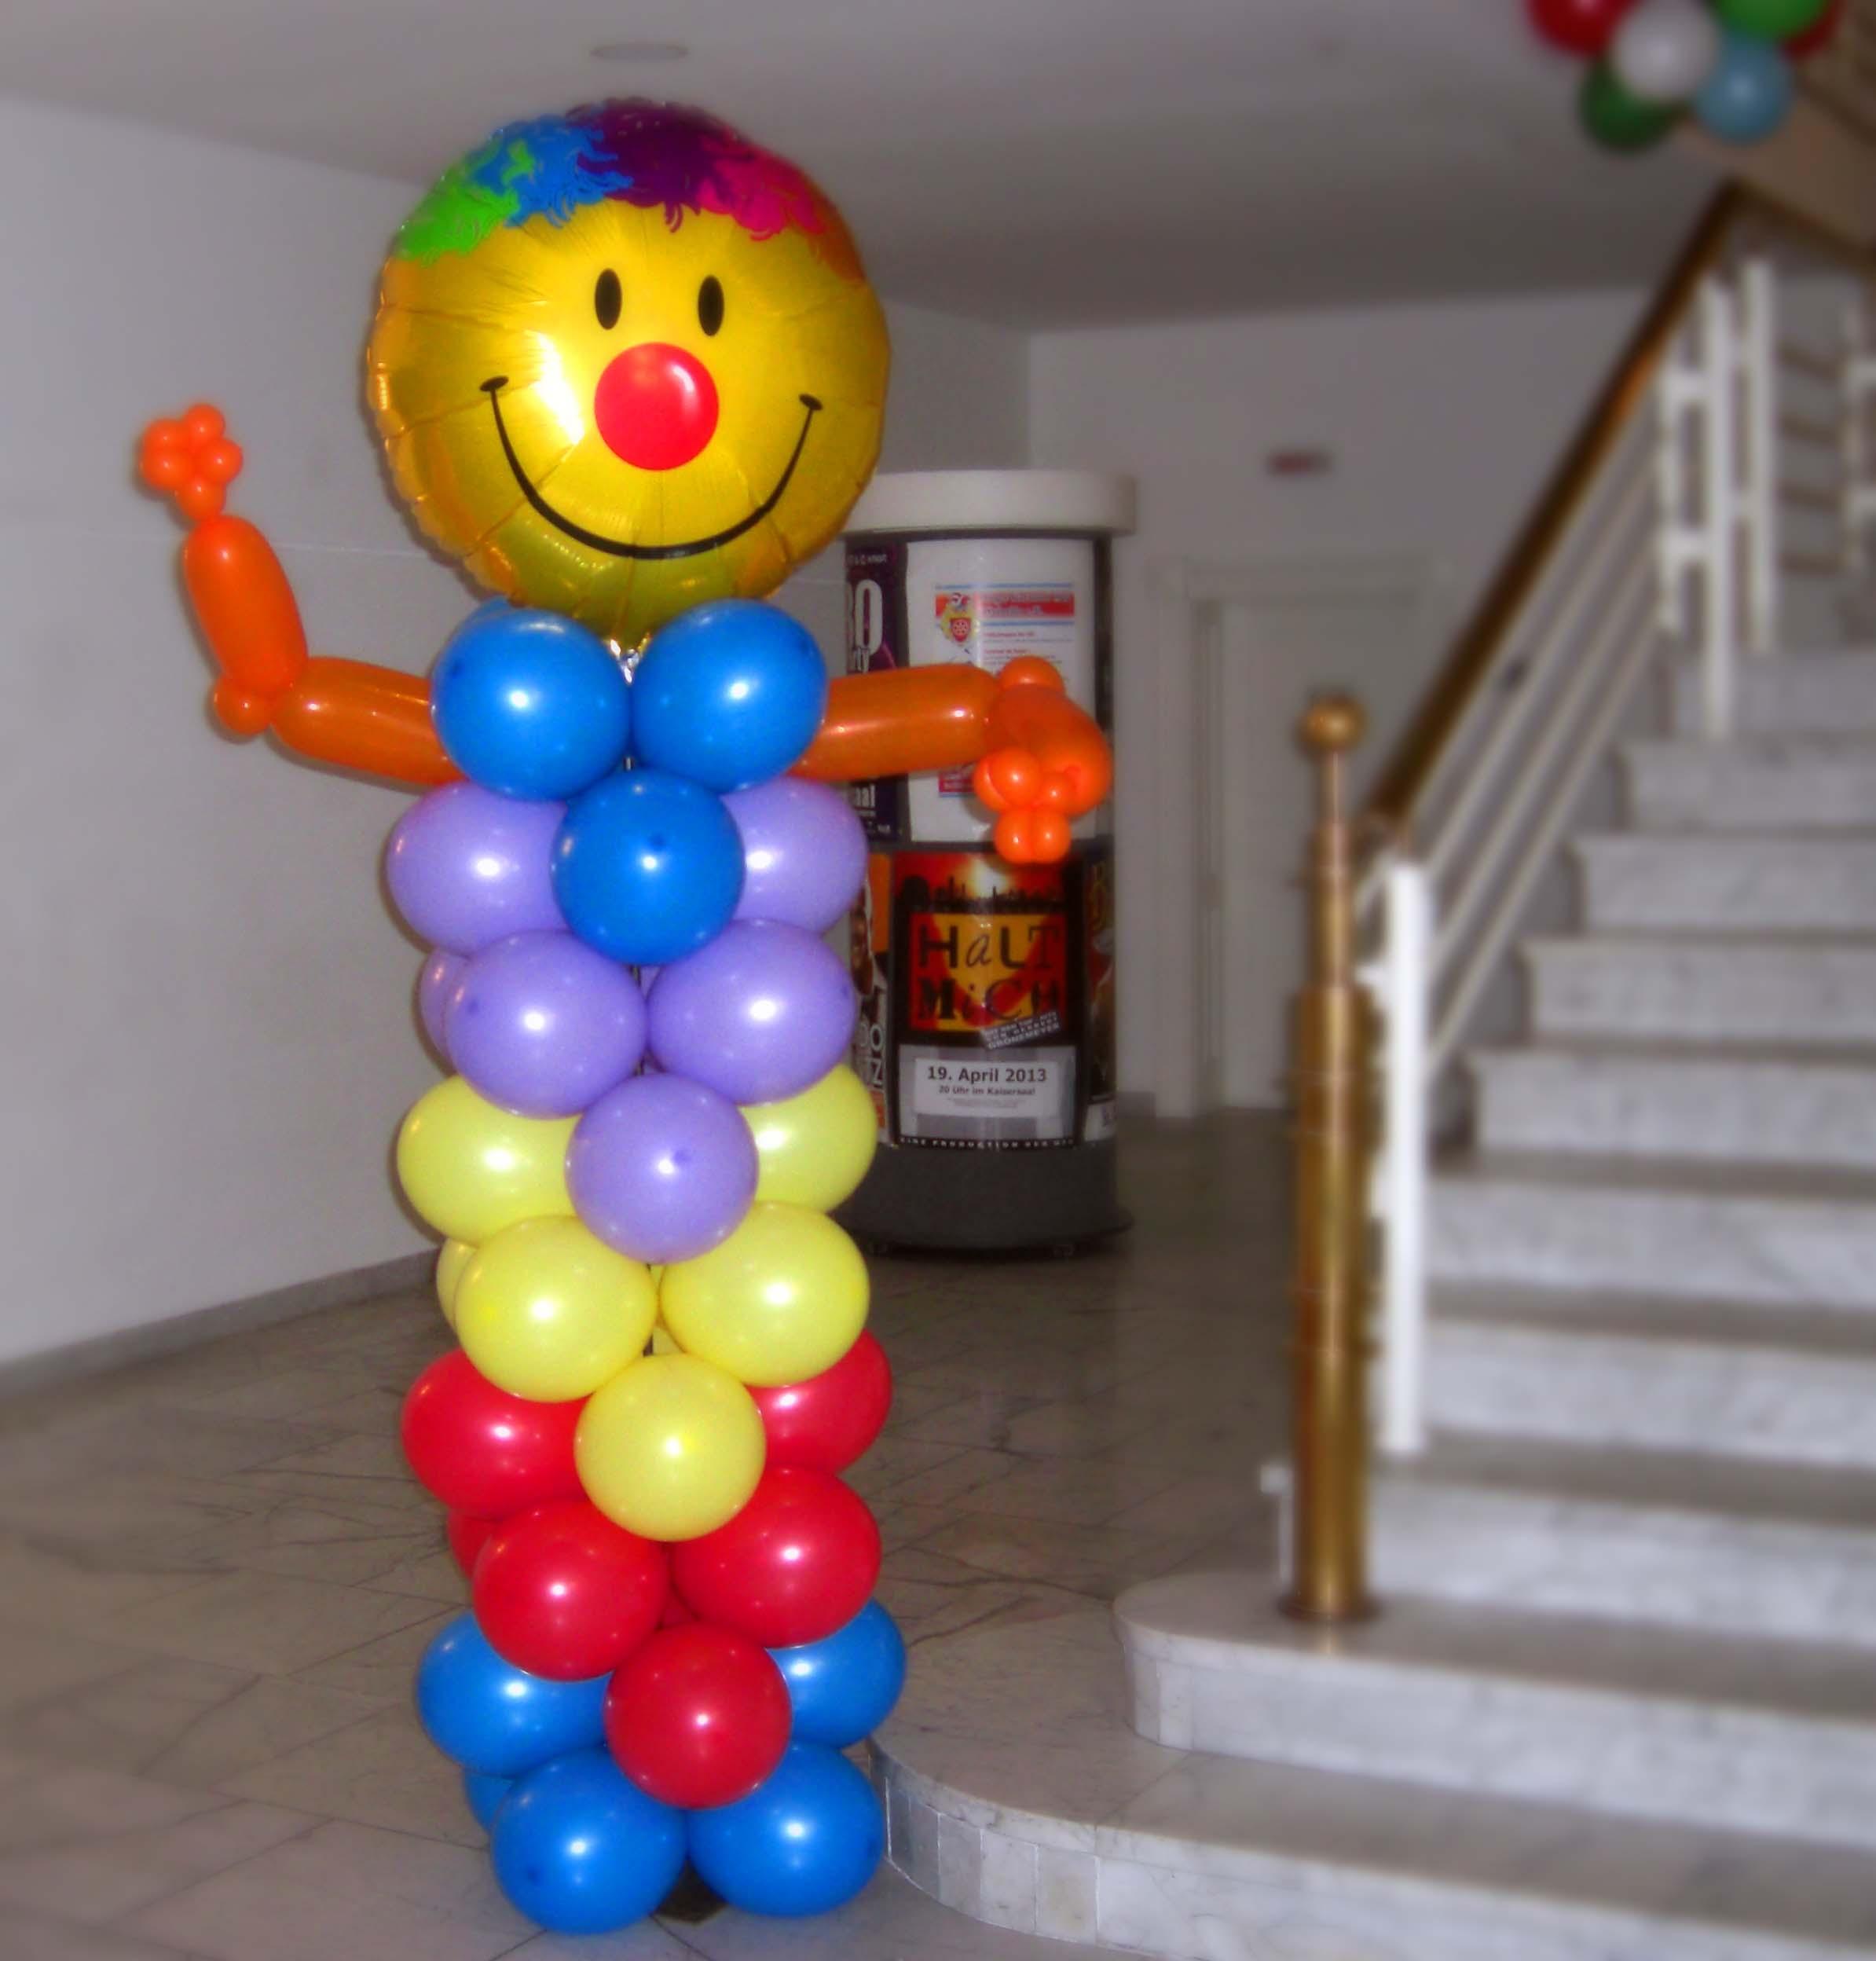 abgehobene geschenke ballons und ballondekorationen. Black Bedroom Furniture Sets. Home Design Ideas